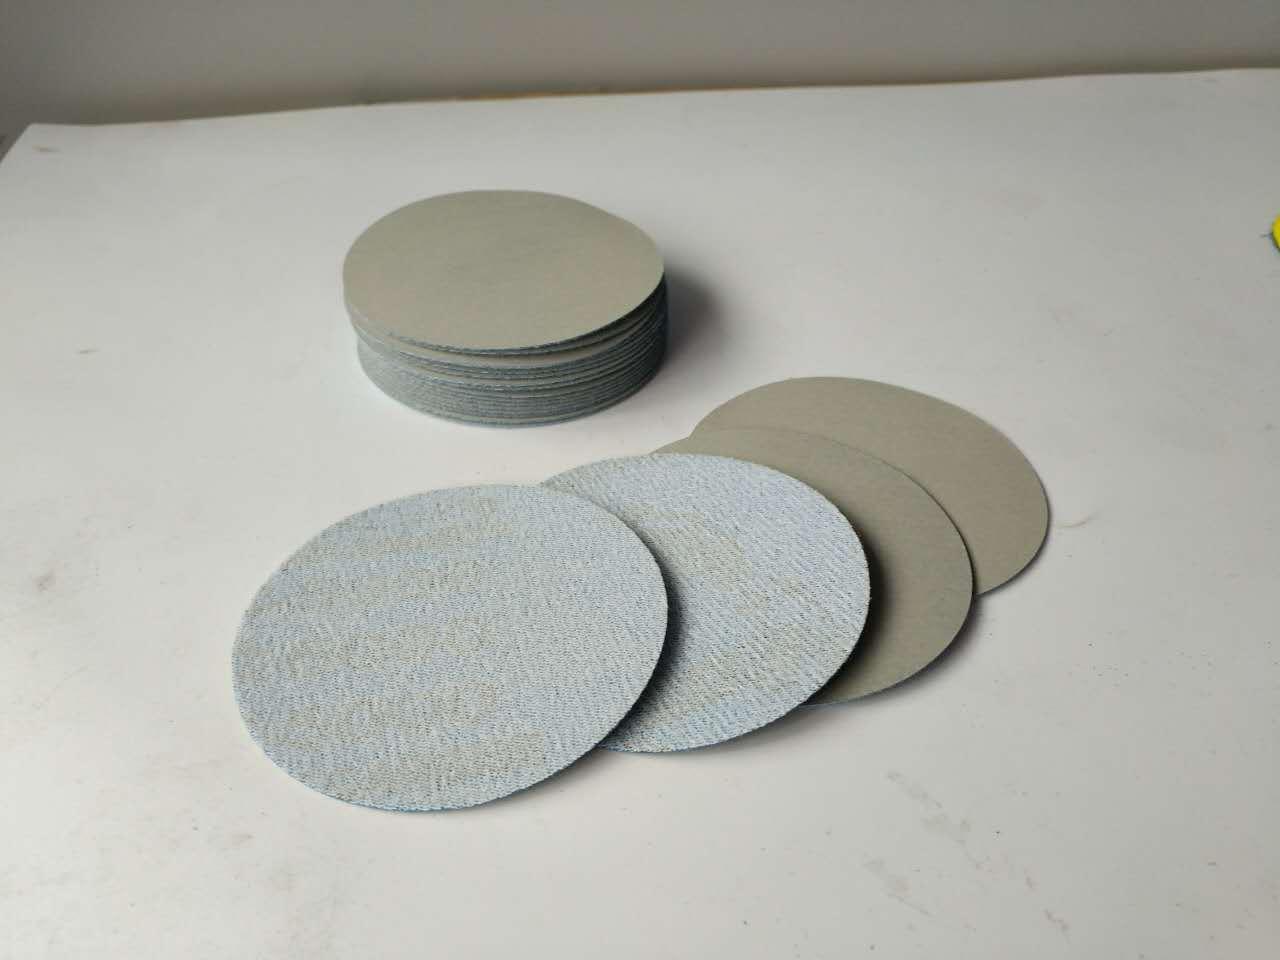 1-Inch 2-Inch 3-Inch 4-Inch 5-Inch 6-Inch 7-Inch 3000 # Import Gray Dragon Flocked Polishing Sand Paper Disc SNAD Paper Disk